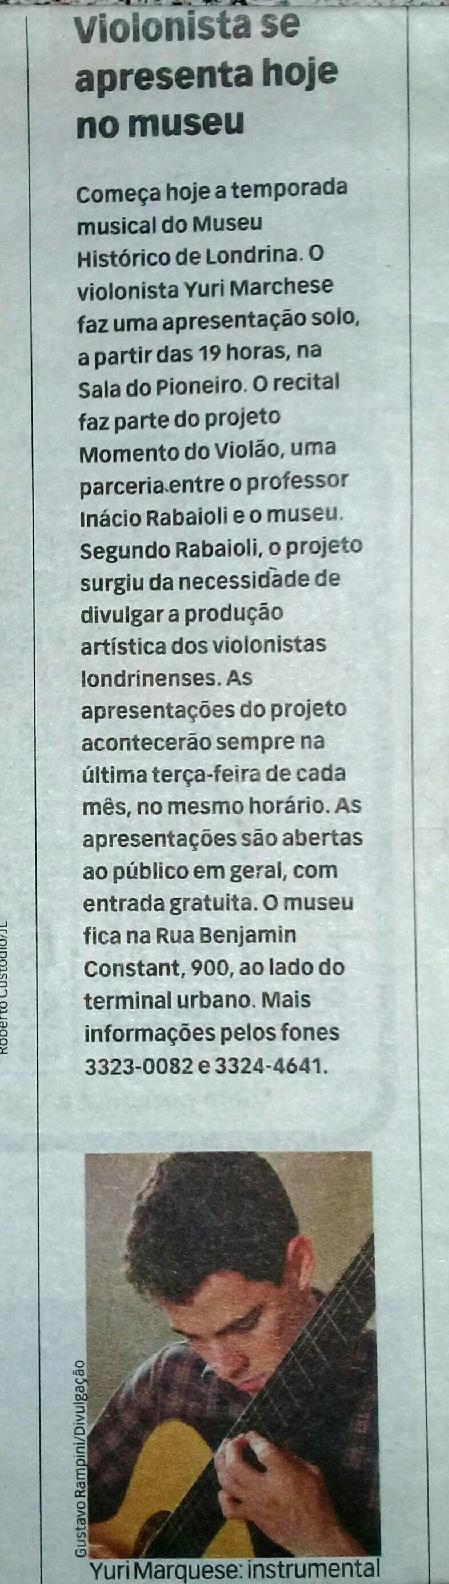 Jornal de Londrina 29-03-2011